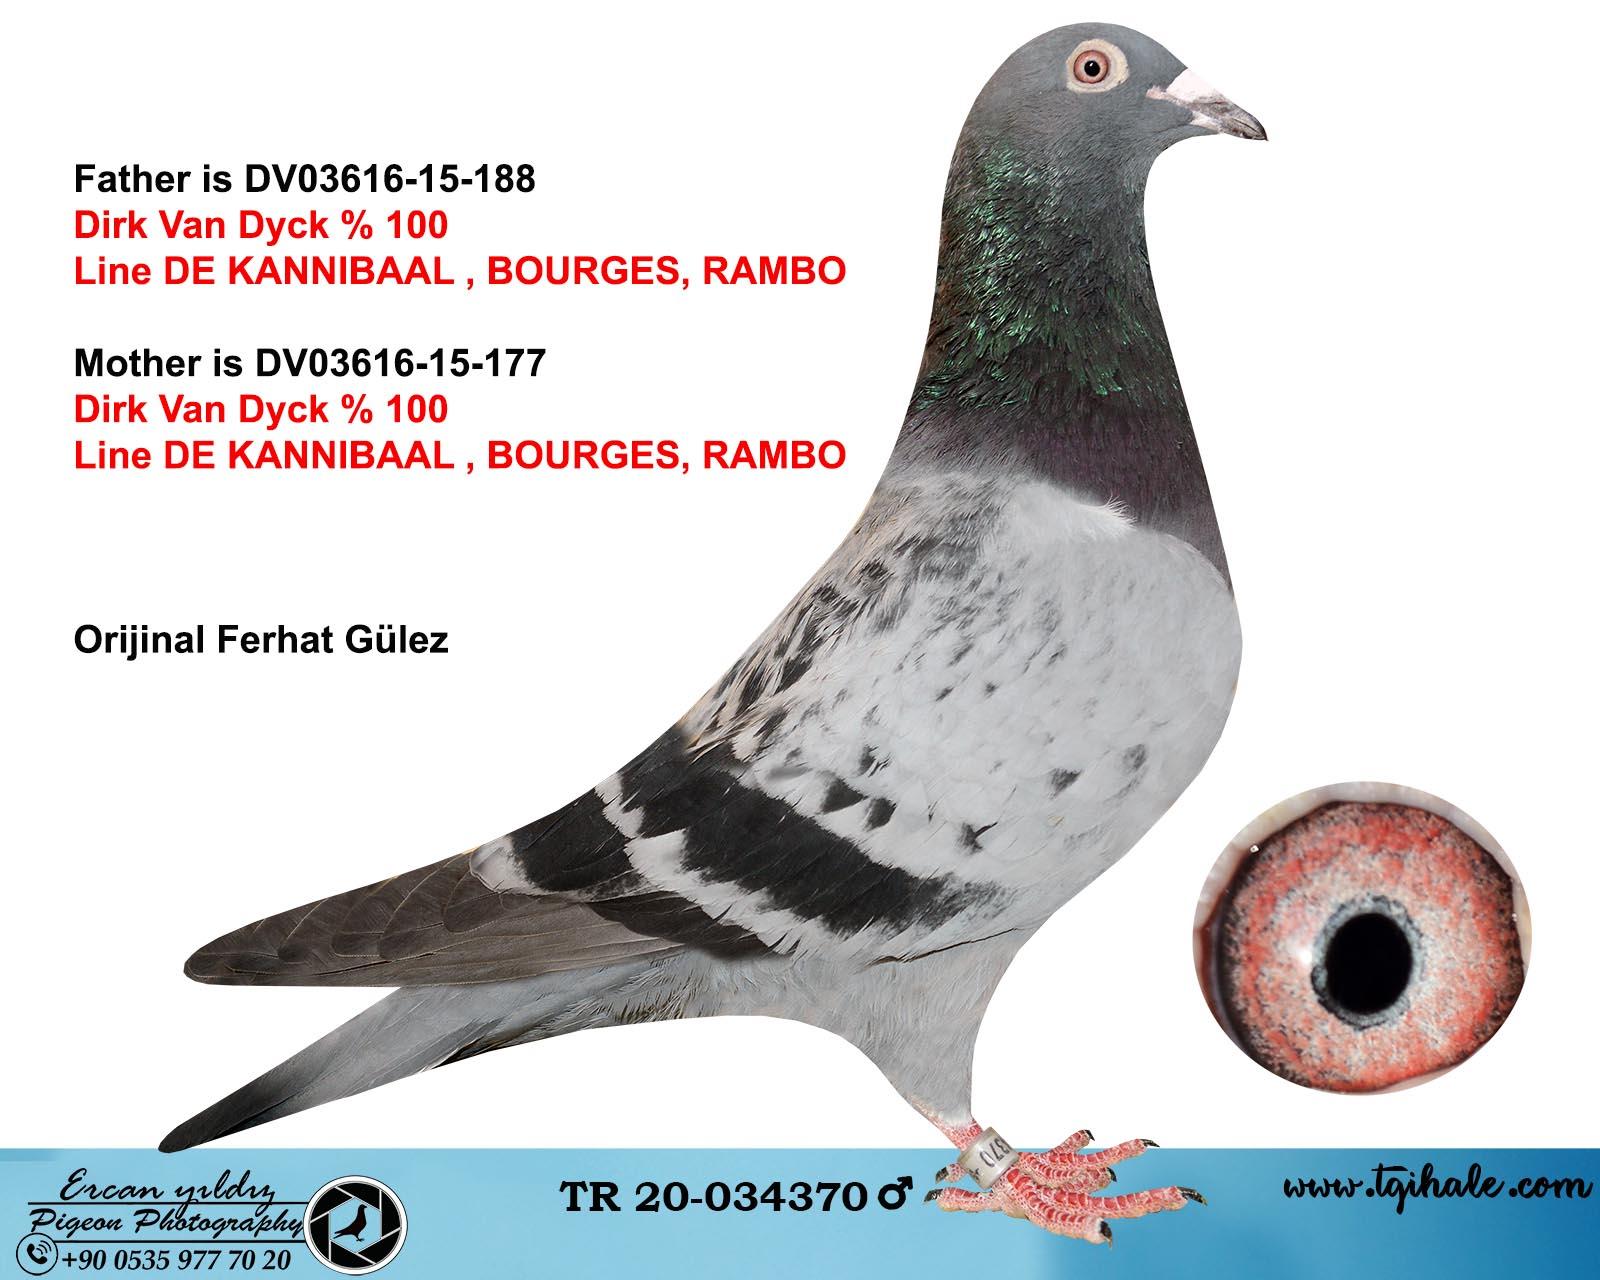 TR20-034370 ERKEK / DIRK VAN DYCK % 100